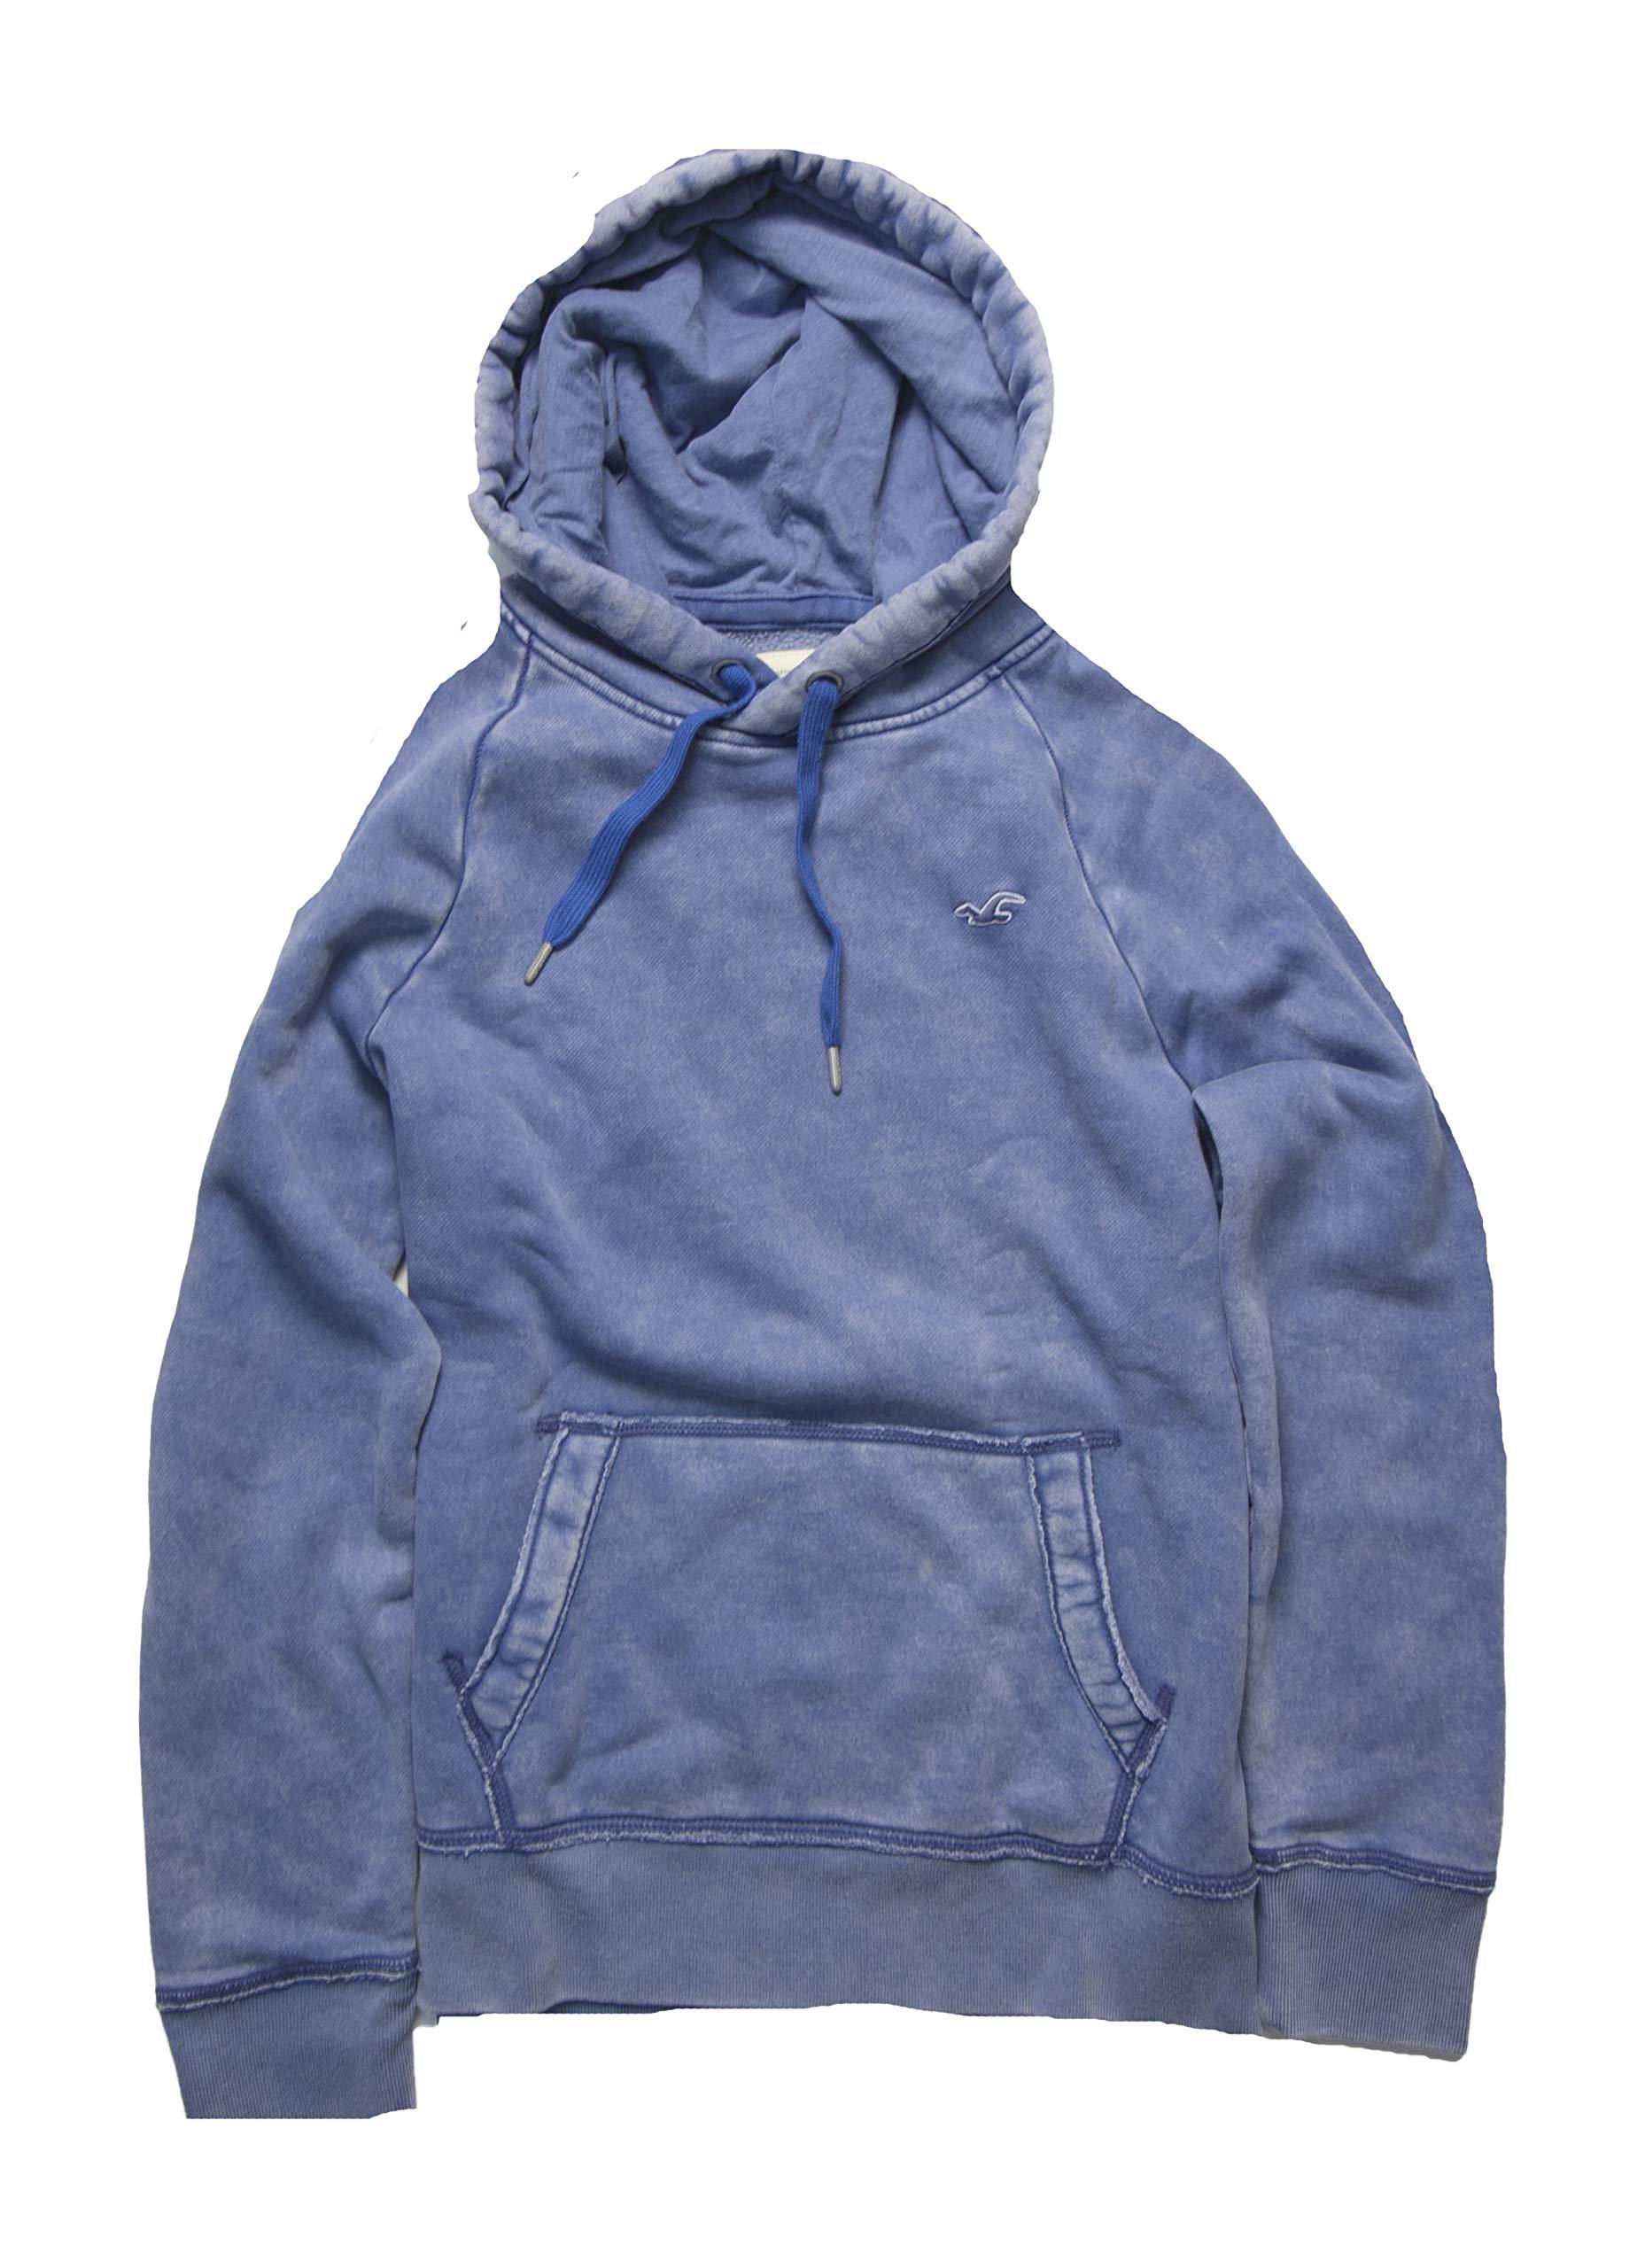 Hollister Men's Hoodie Sweatshirt Pullover (M, Blue 5005) by Hollister